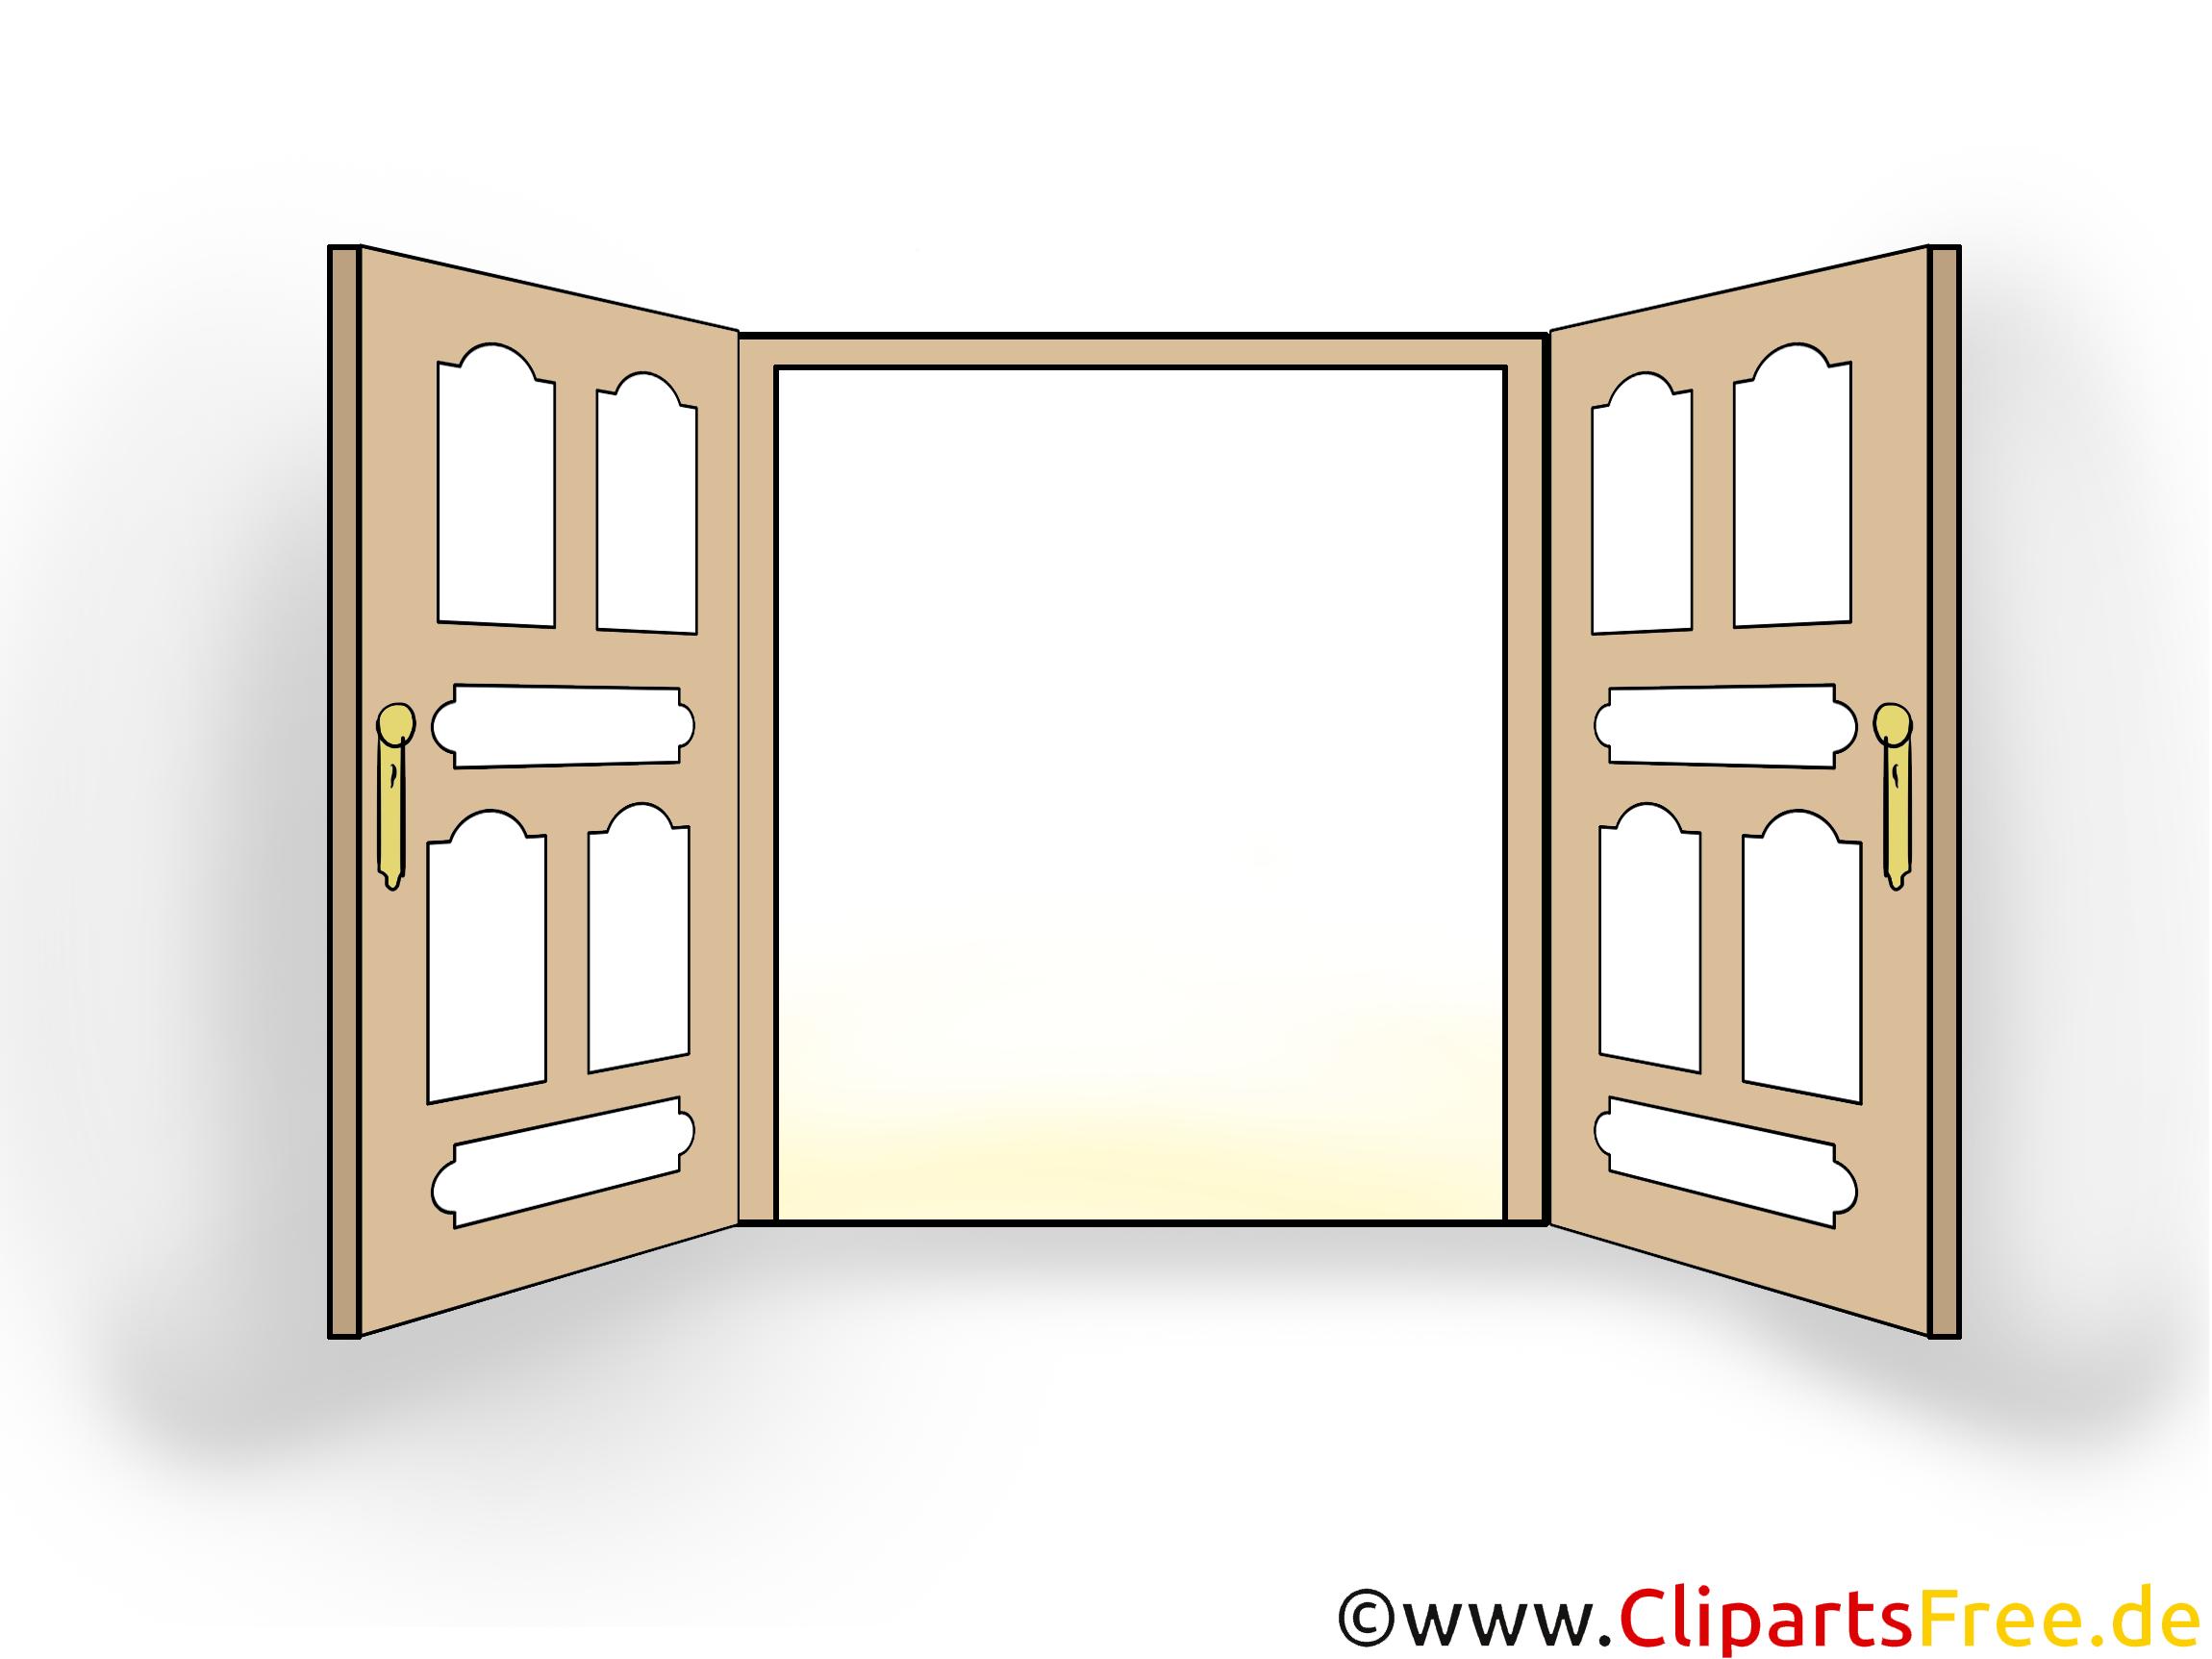 Doppeltür Clipart, Bild, Illustration